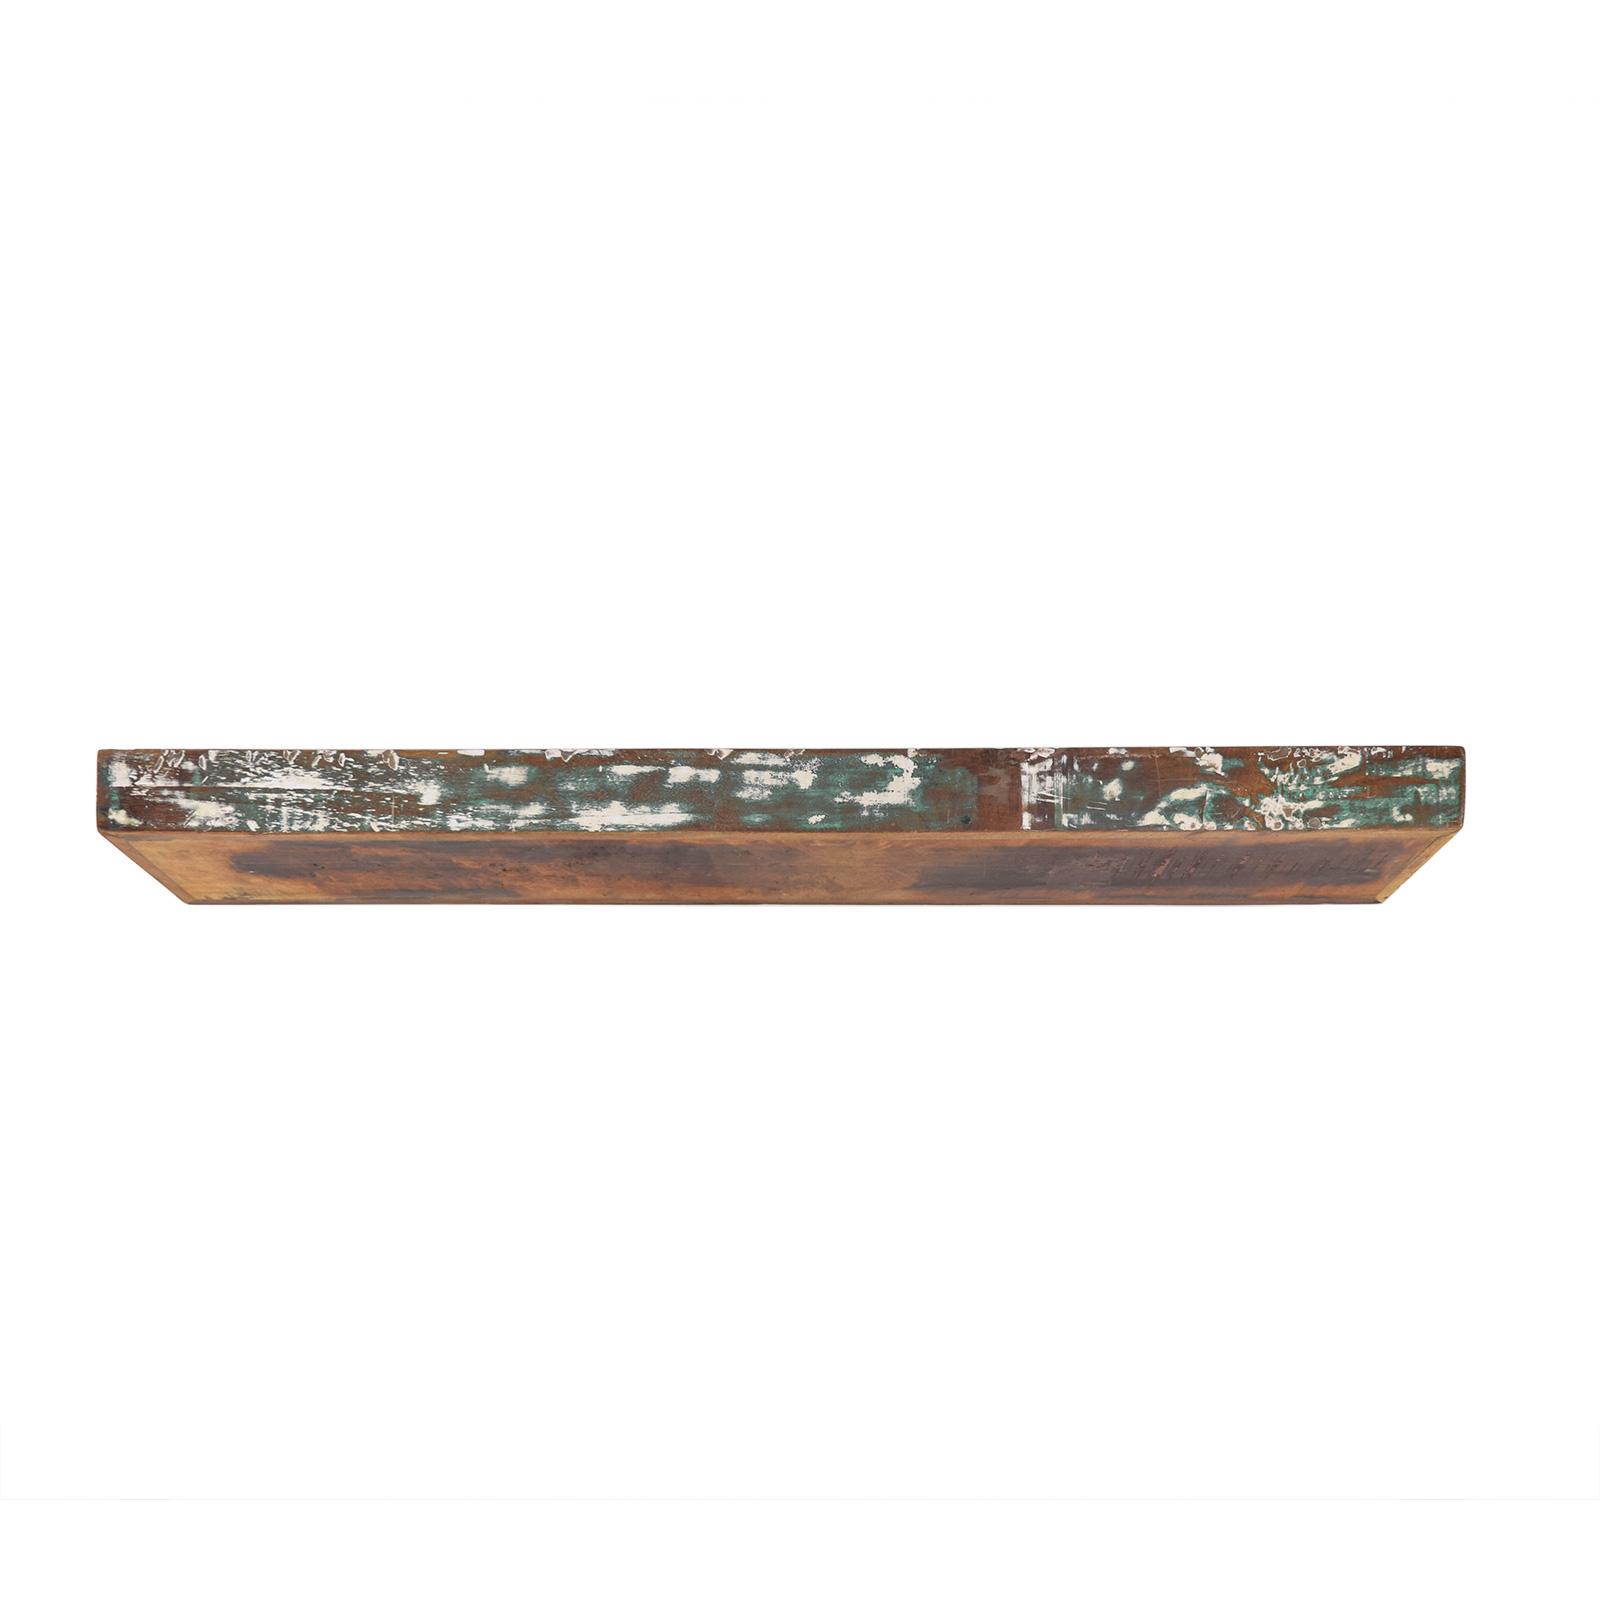 wandregal-malm-aus-recyceltem-massivholz-120cm-breit